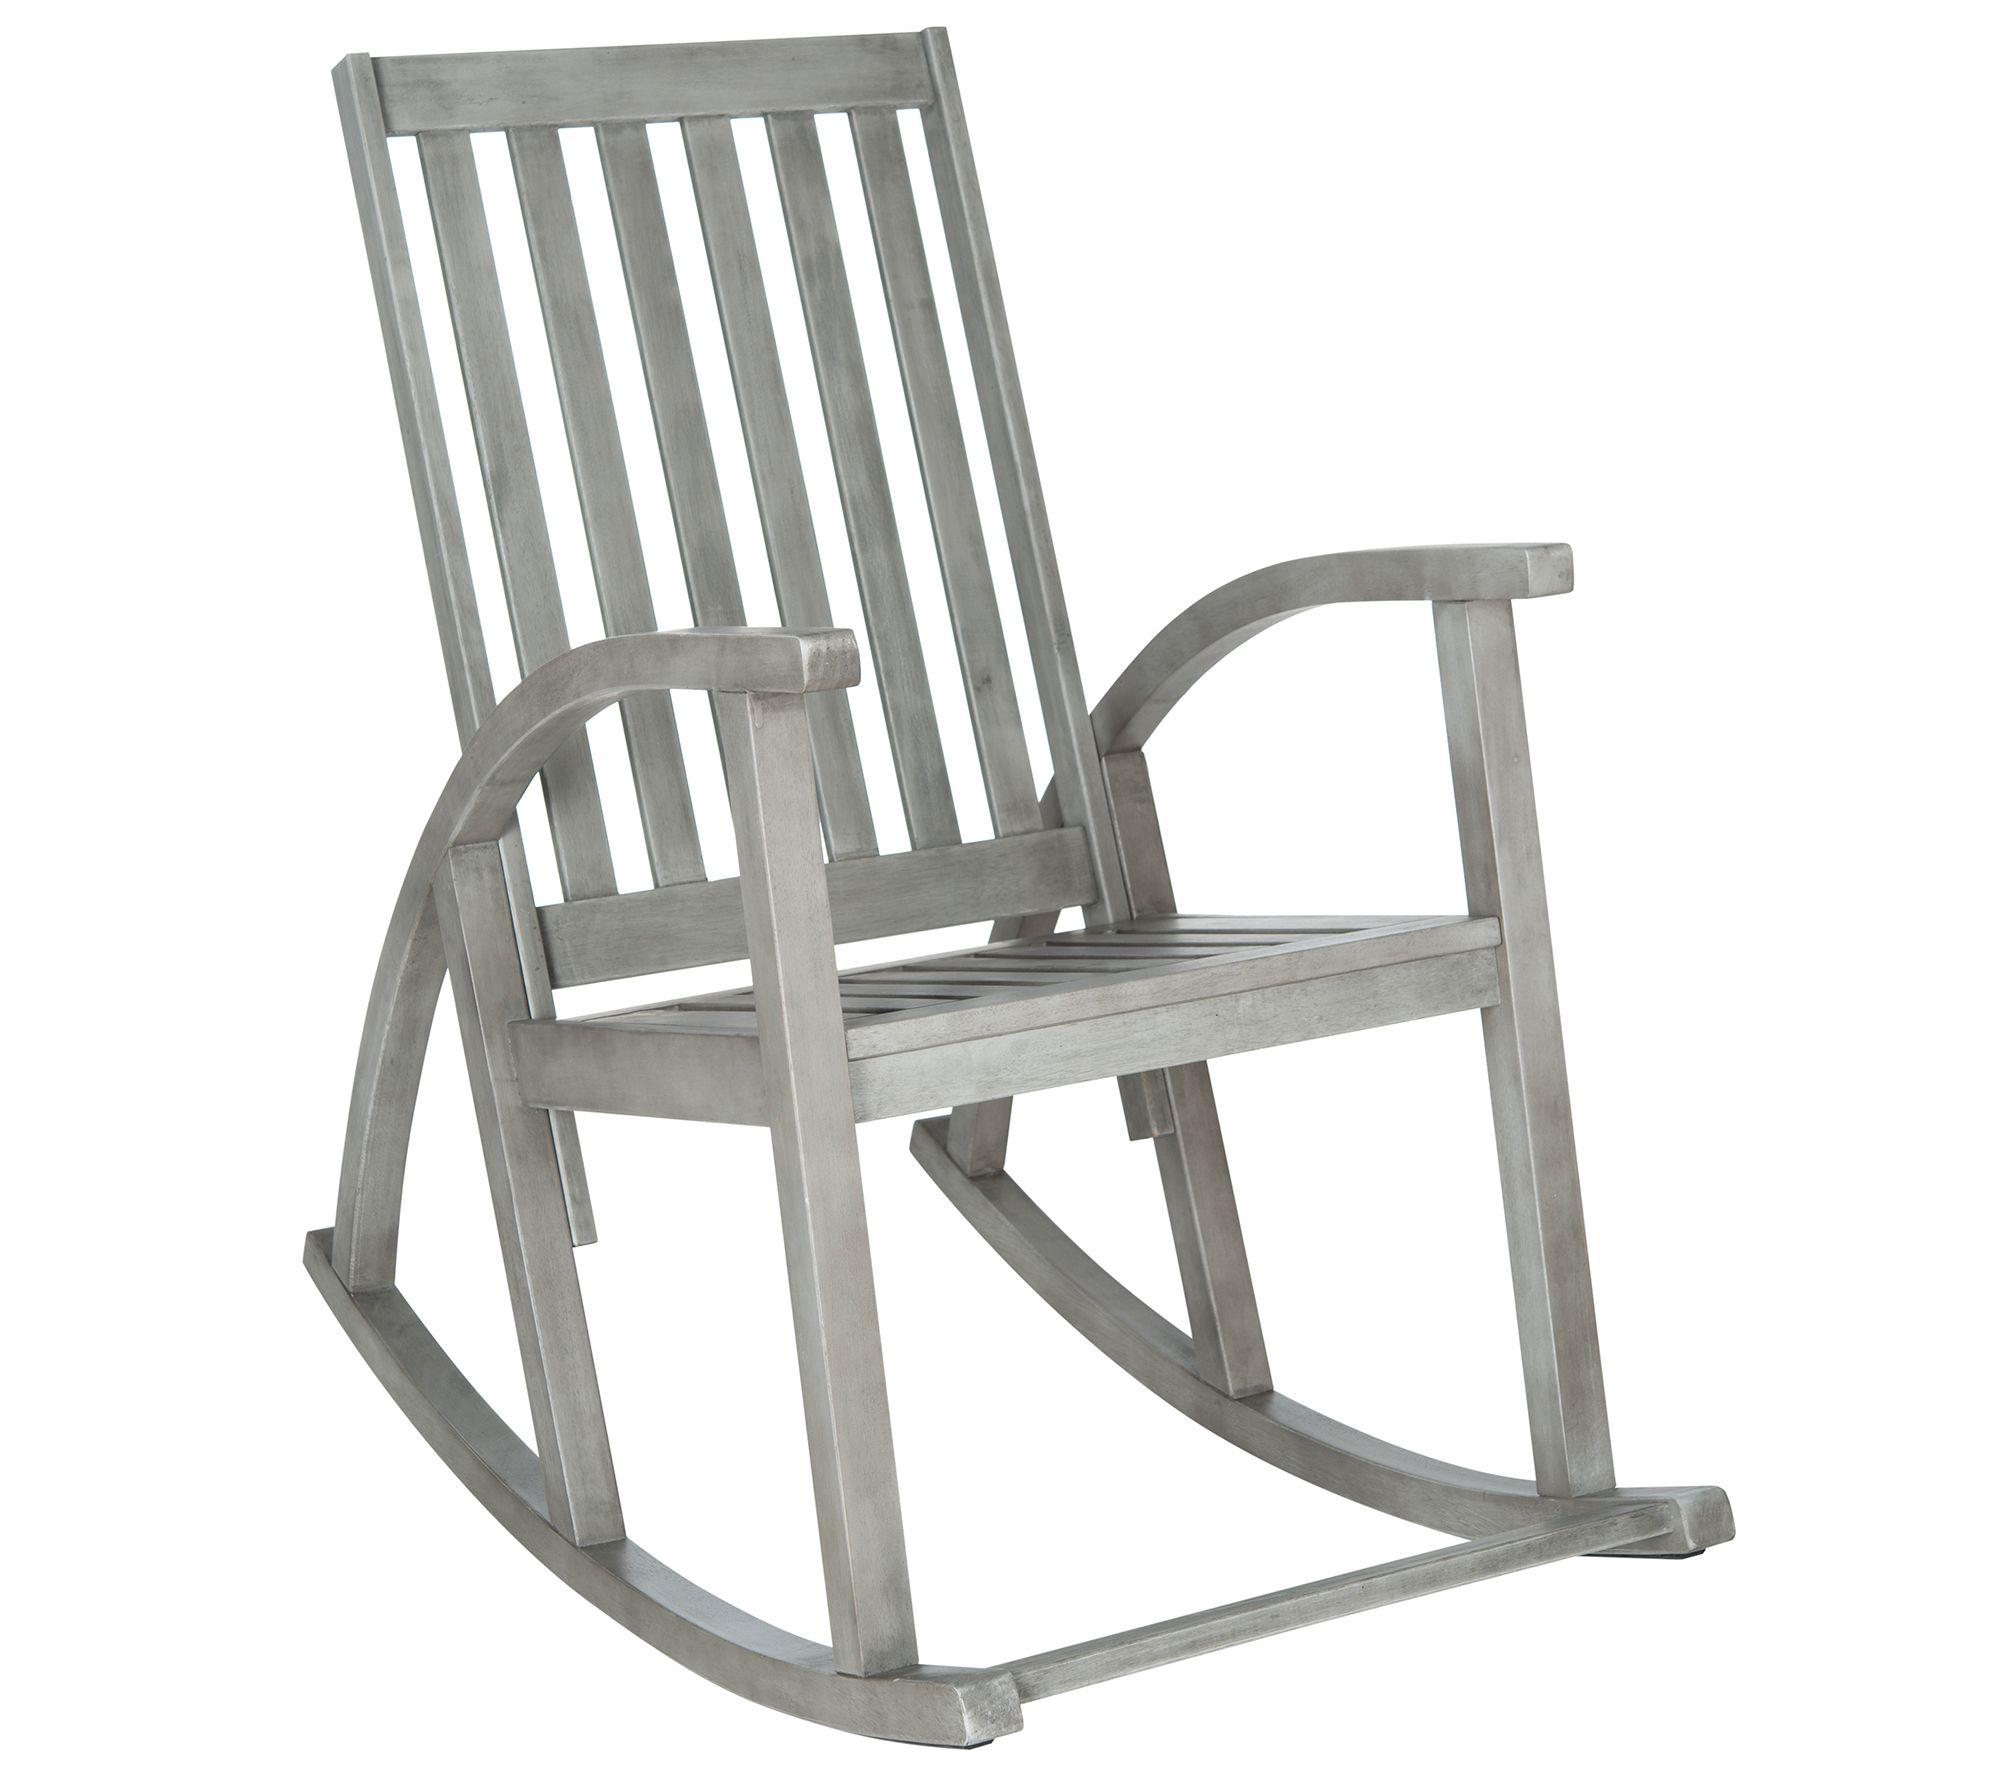 Brilliant Safavieh Clayton Rocking Chair Qvc Com Creativecarmelina Interior Chair Design Creativecarmelinacom